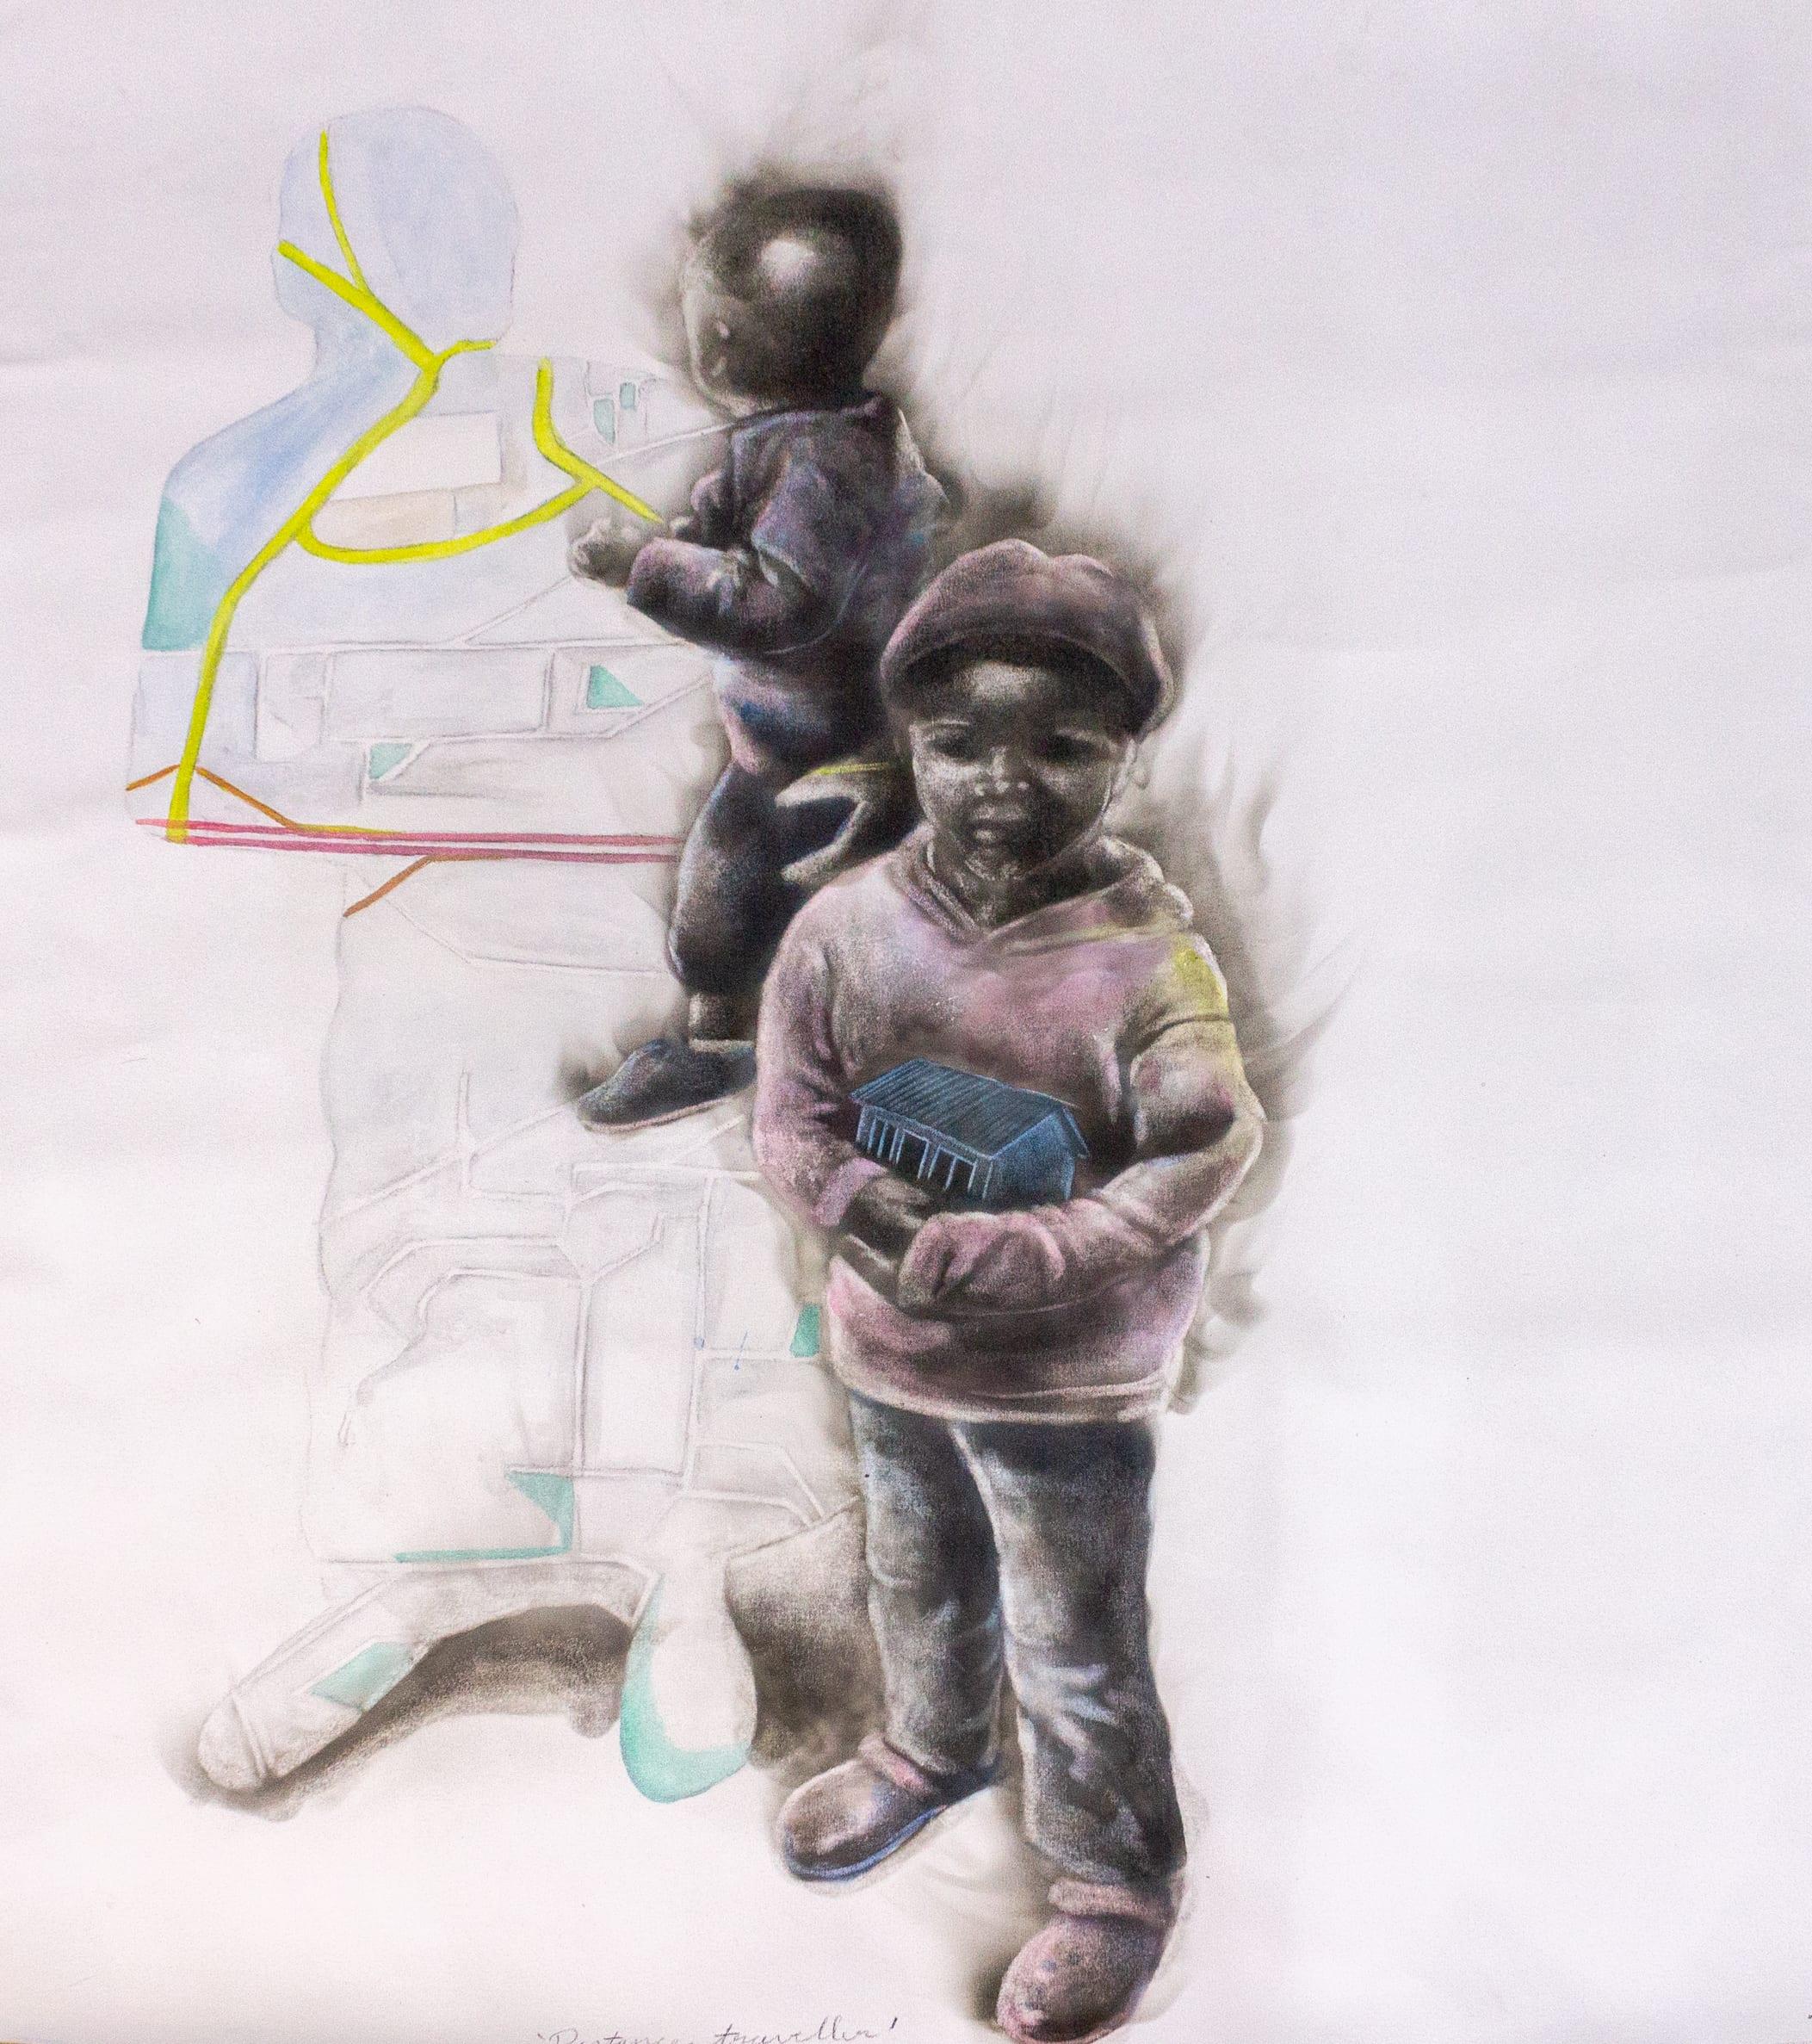 <span class=&#34;link fancybox-details-link&#34;><a href=&#34;/artists/54-azael-langa/works/3295-azael-langa-distance-traveller-2019/&#34;>View Detail Page</a></span><div class=&#34;artist&#34;><strong>Azael Langa</strong></div> <div class=&#34;title&#34;><em>Distance Traveller</em>, 2019</div> <div class=&#34;medium&#34;>Smoke, Ink And String On Canvas</div> <div class=&#34;dimensions&#34;>127cm x 111cm (144.5cm x 128.5cm framed)</div><div class=&#34;price&#34;>R36,000.00</div>